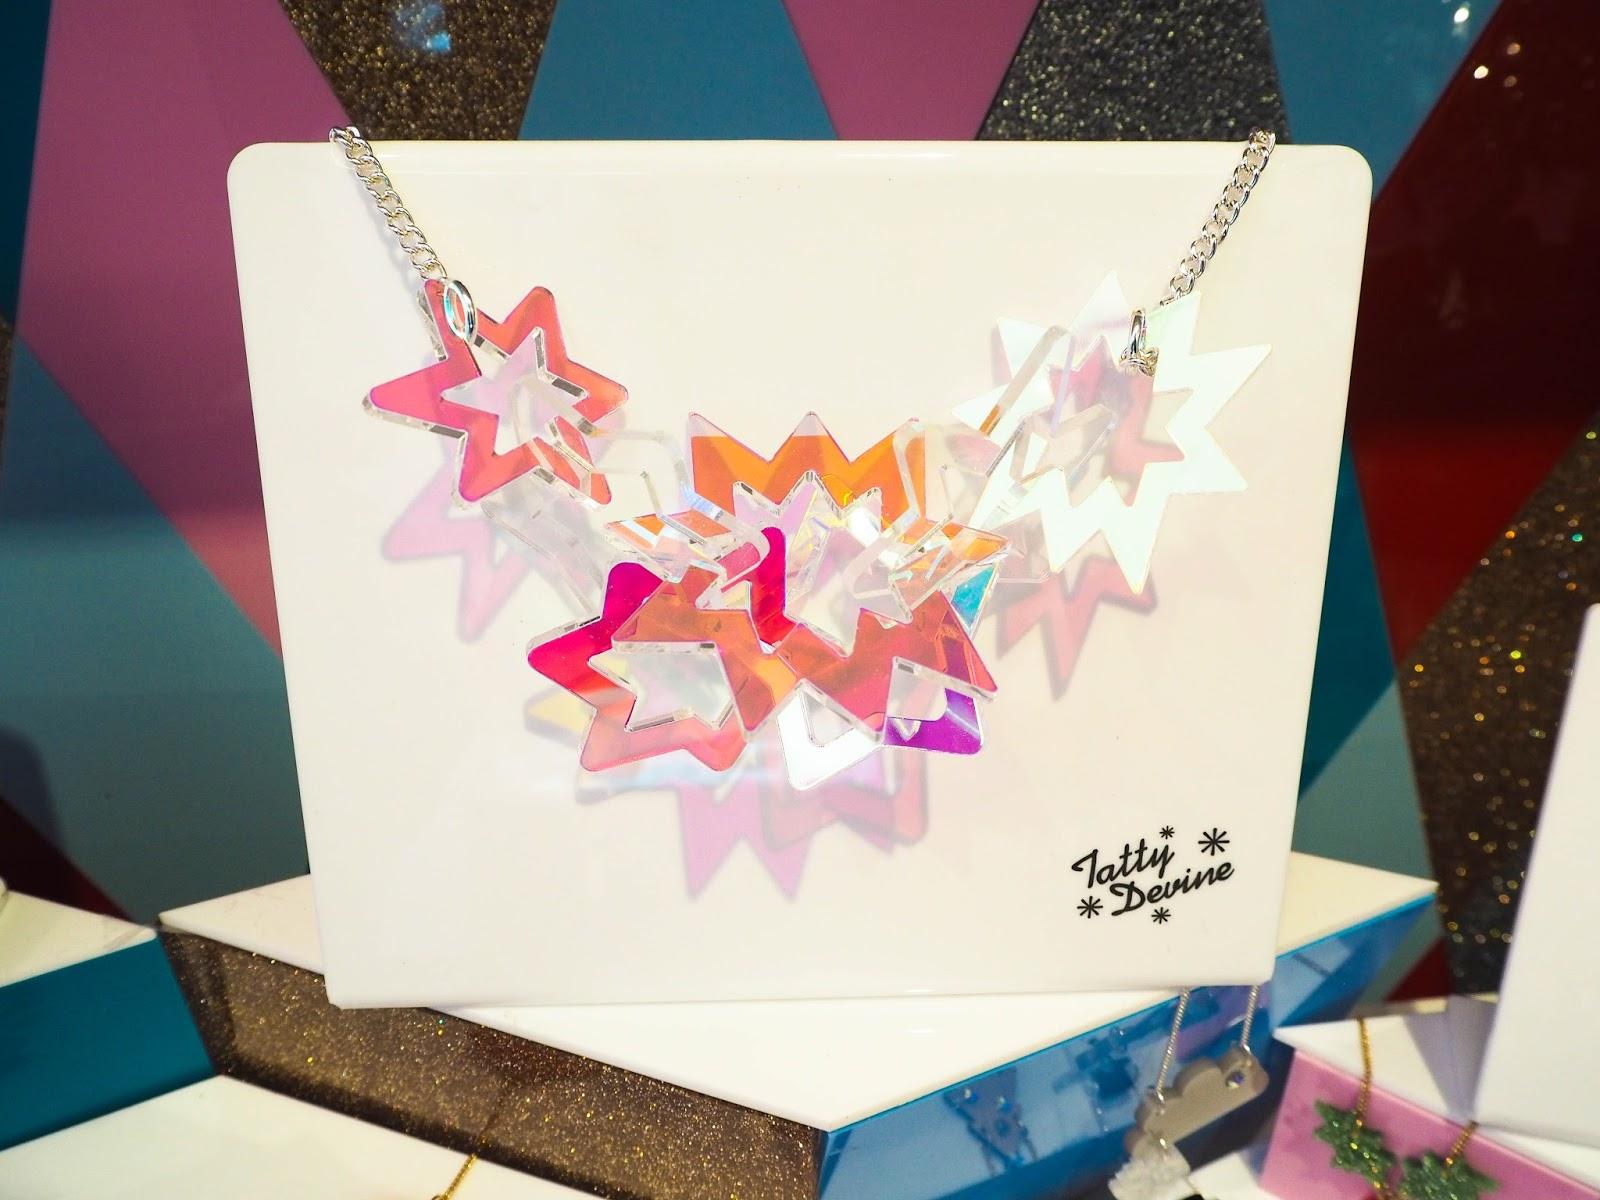 Tatty Devine Christmas stars necklace